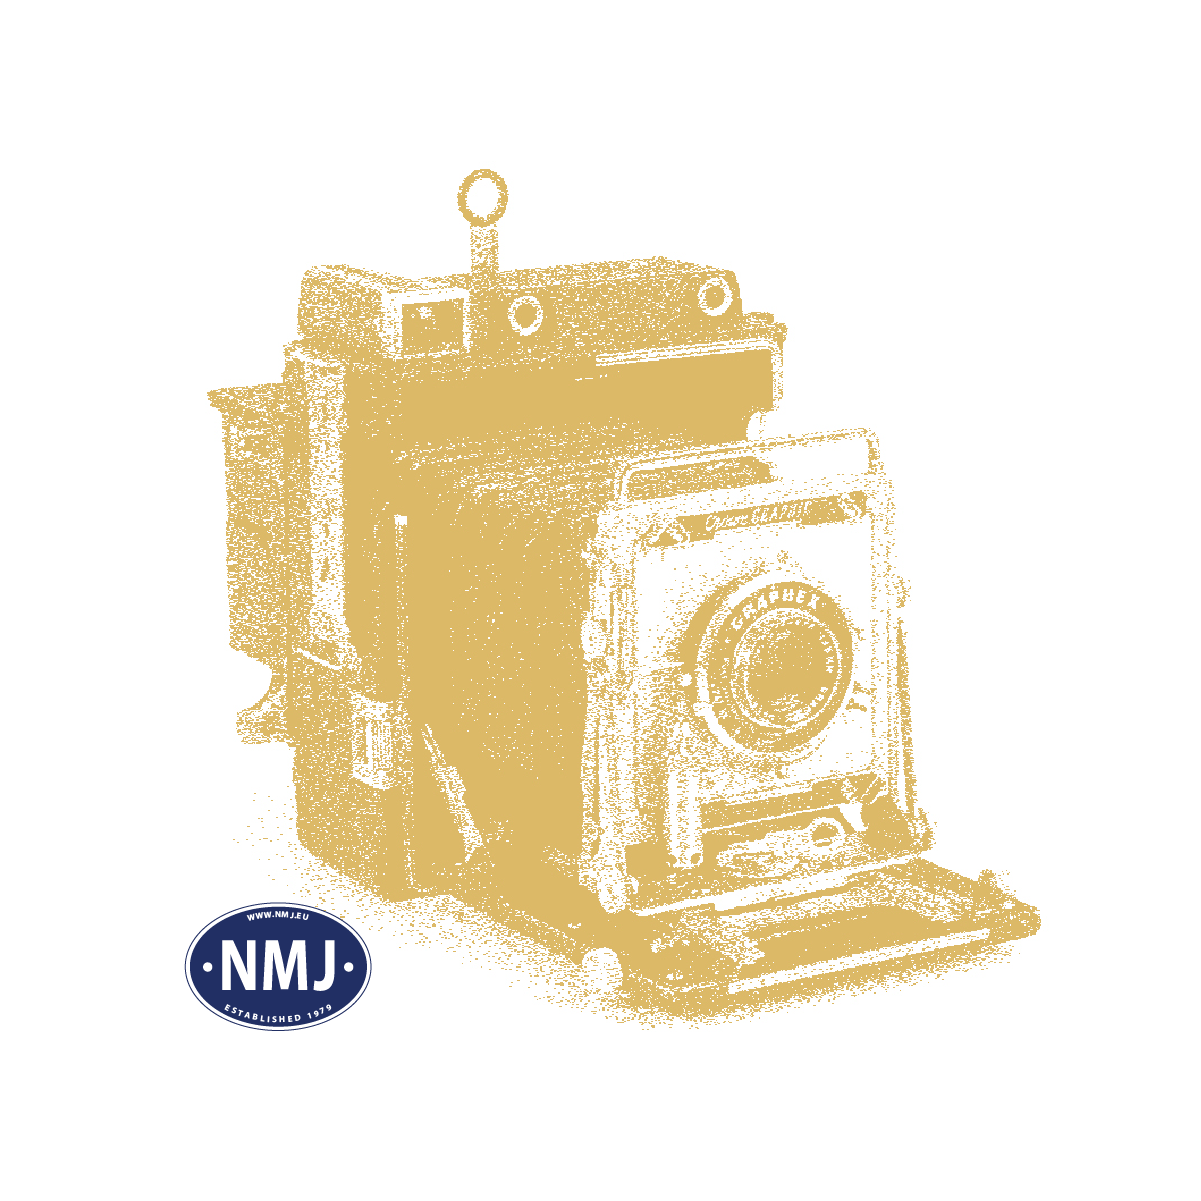 NMJT134.102 - NMJ Topline NSB DF37 21306, Gammeldesign